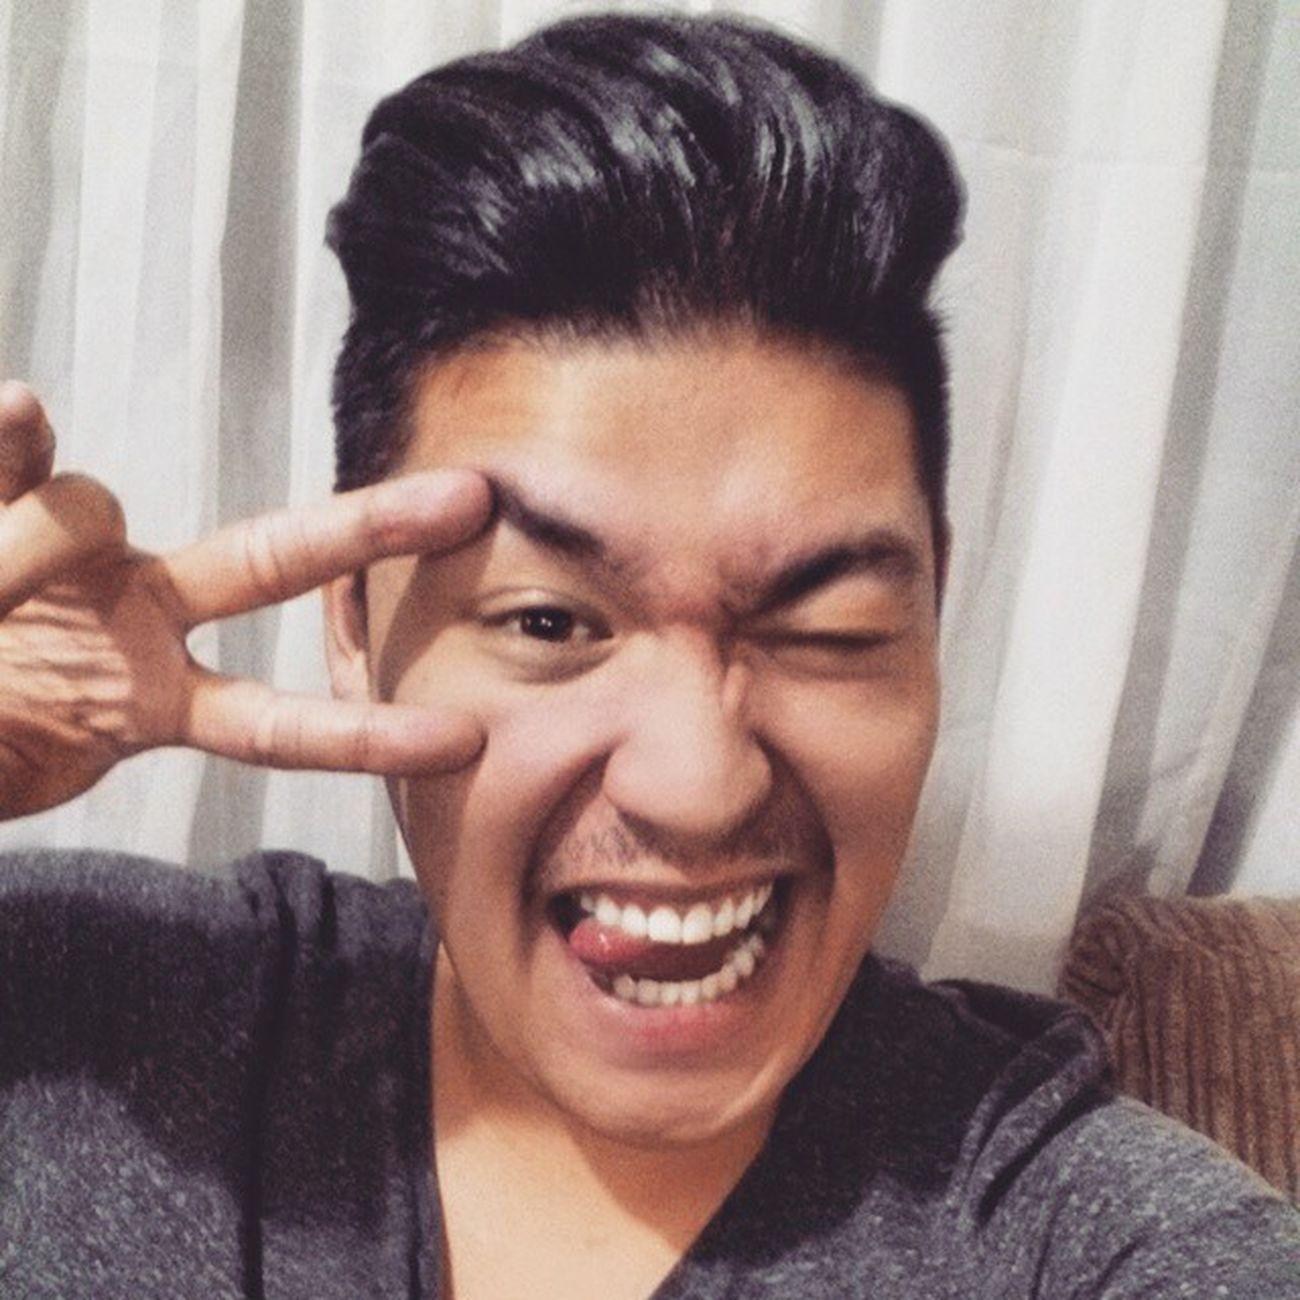 FINAL SELFIE OF 2014 ! | 😬😬😬 | Solong 2014 Hello 2015  NewYear Selfie VainBitch InstaGay Gaysian Filipino SedinoFilipino Igers London BishesOfHoebun